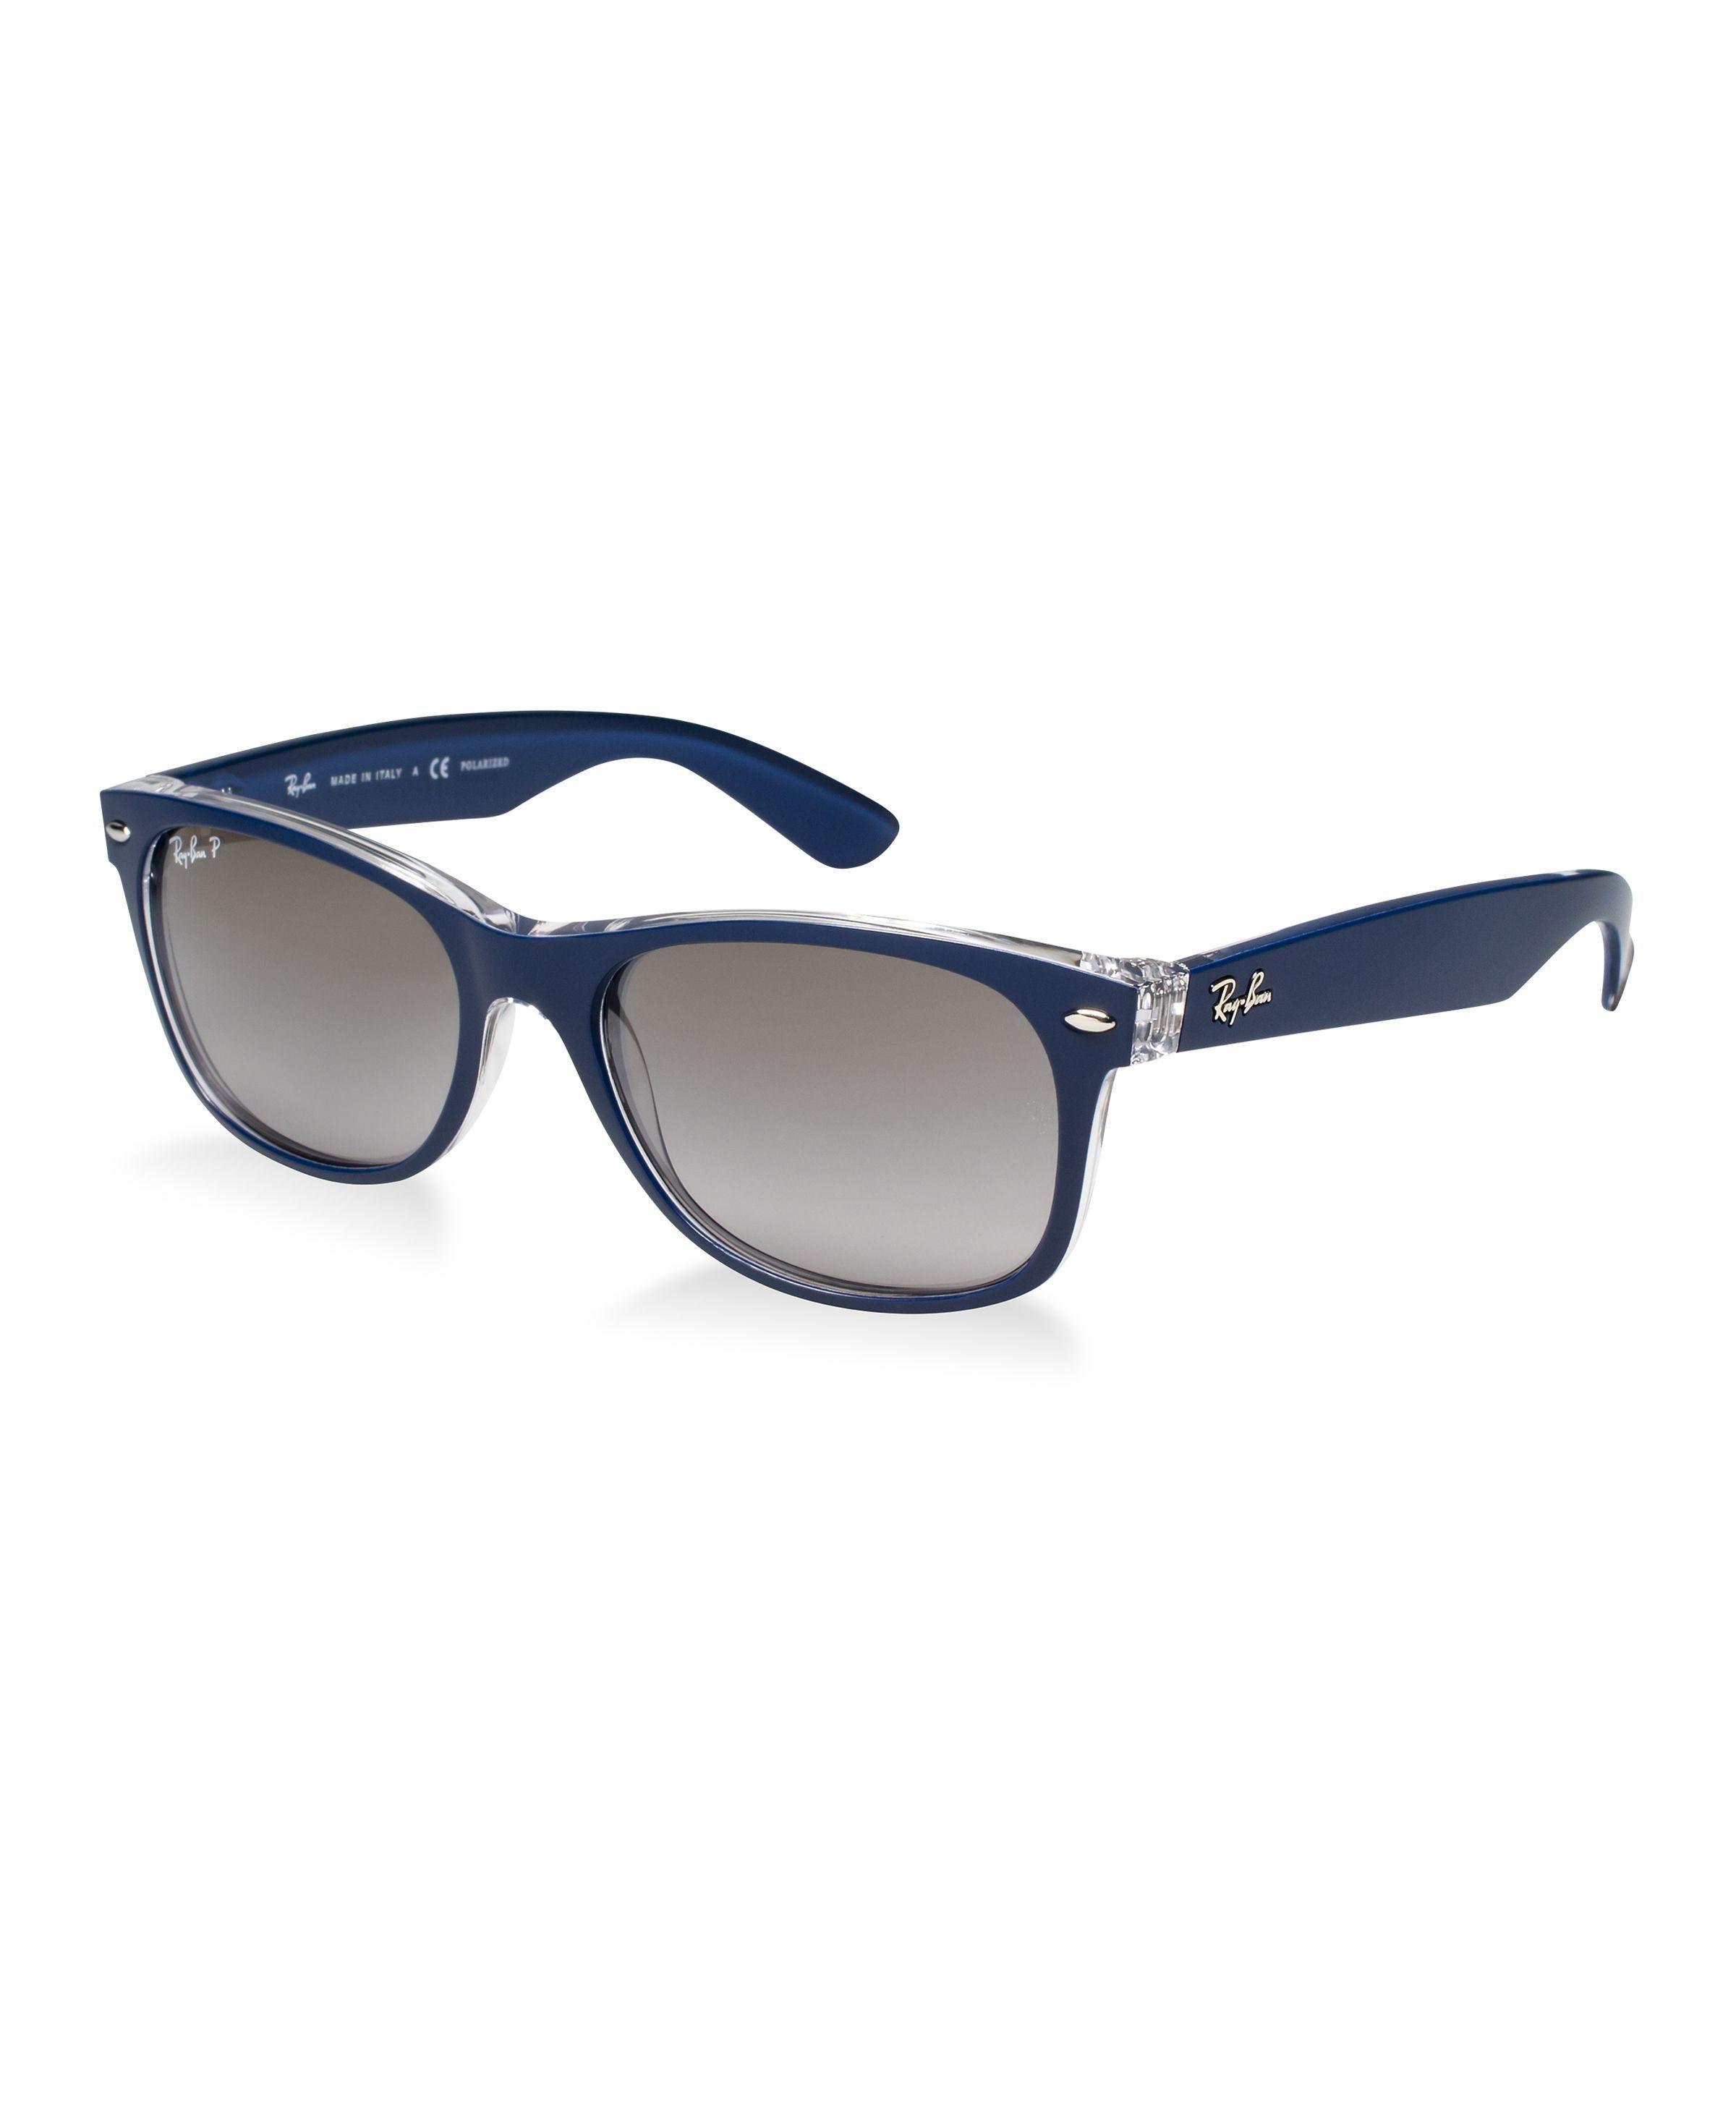 3f259dabc9f Ray-Ban Sunglasses